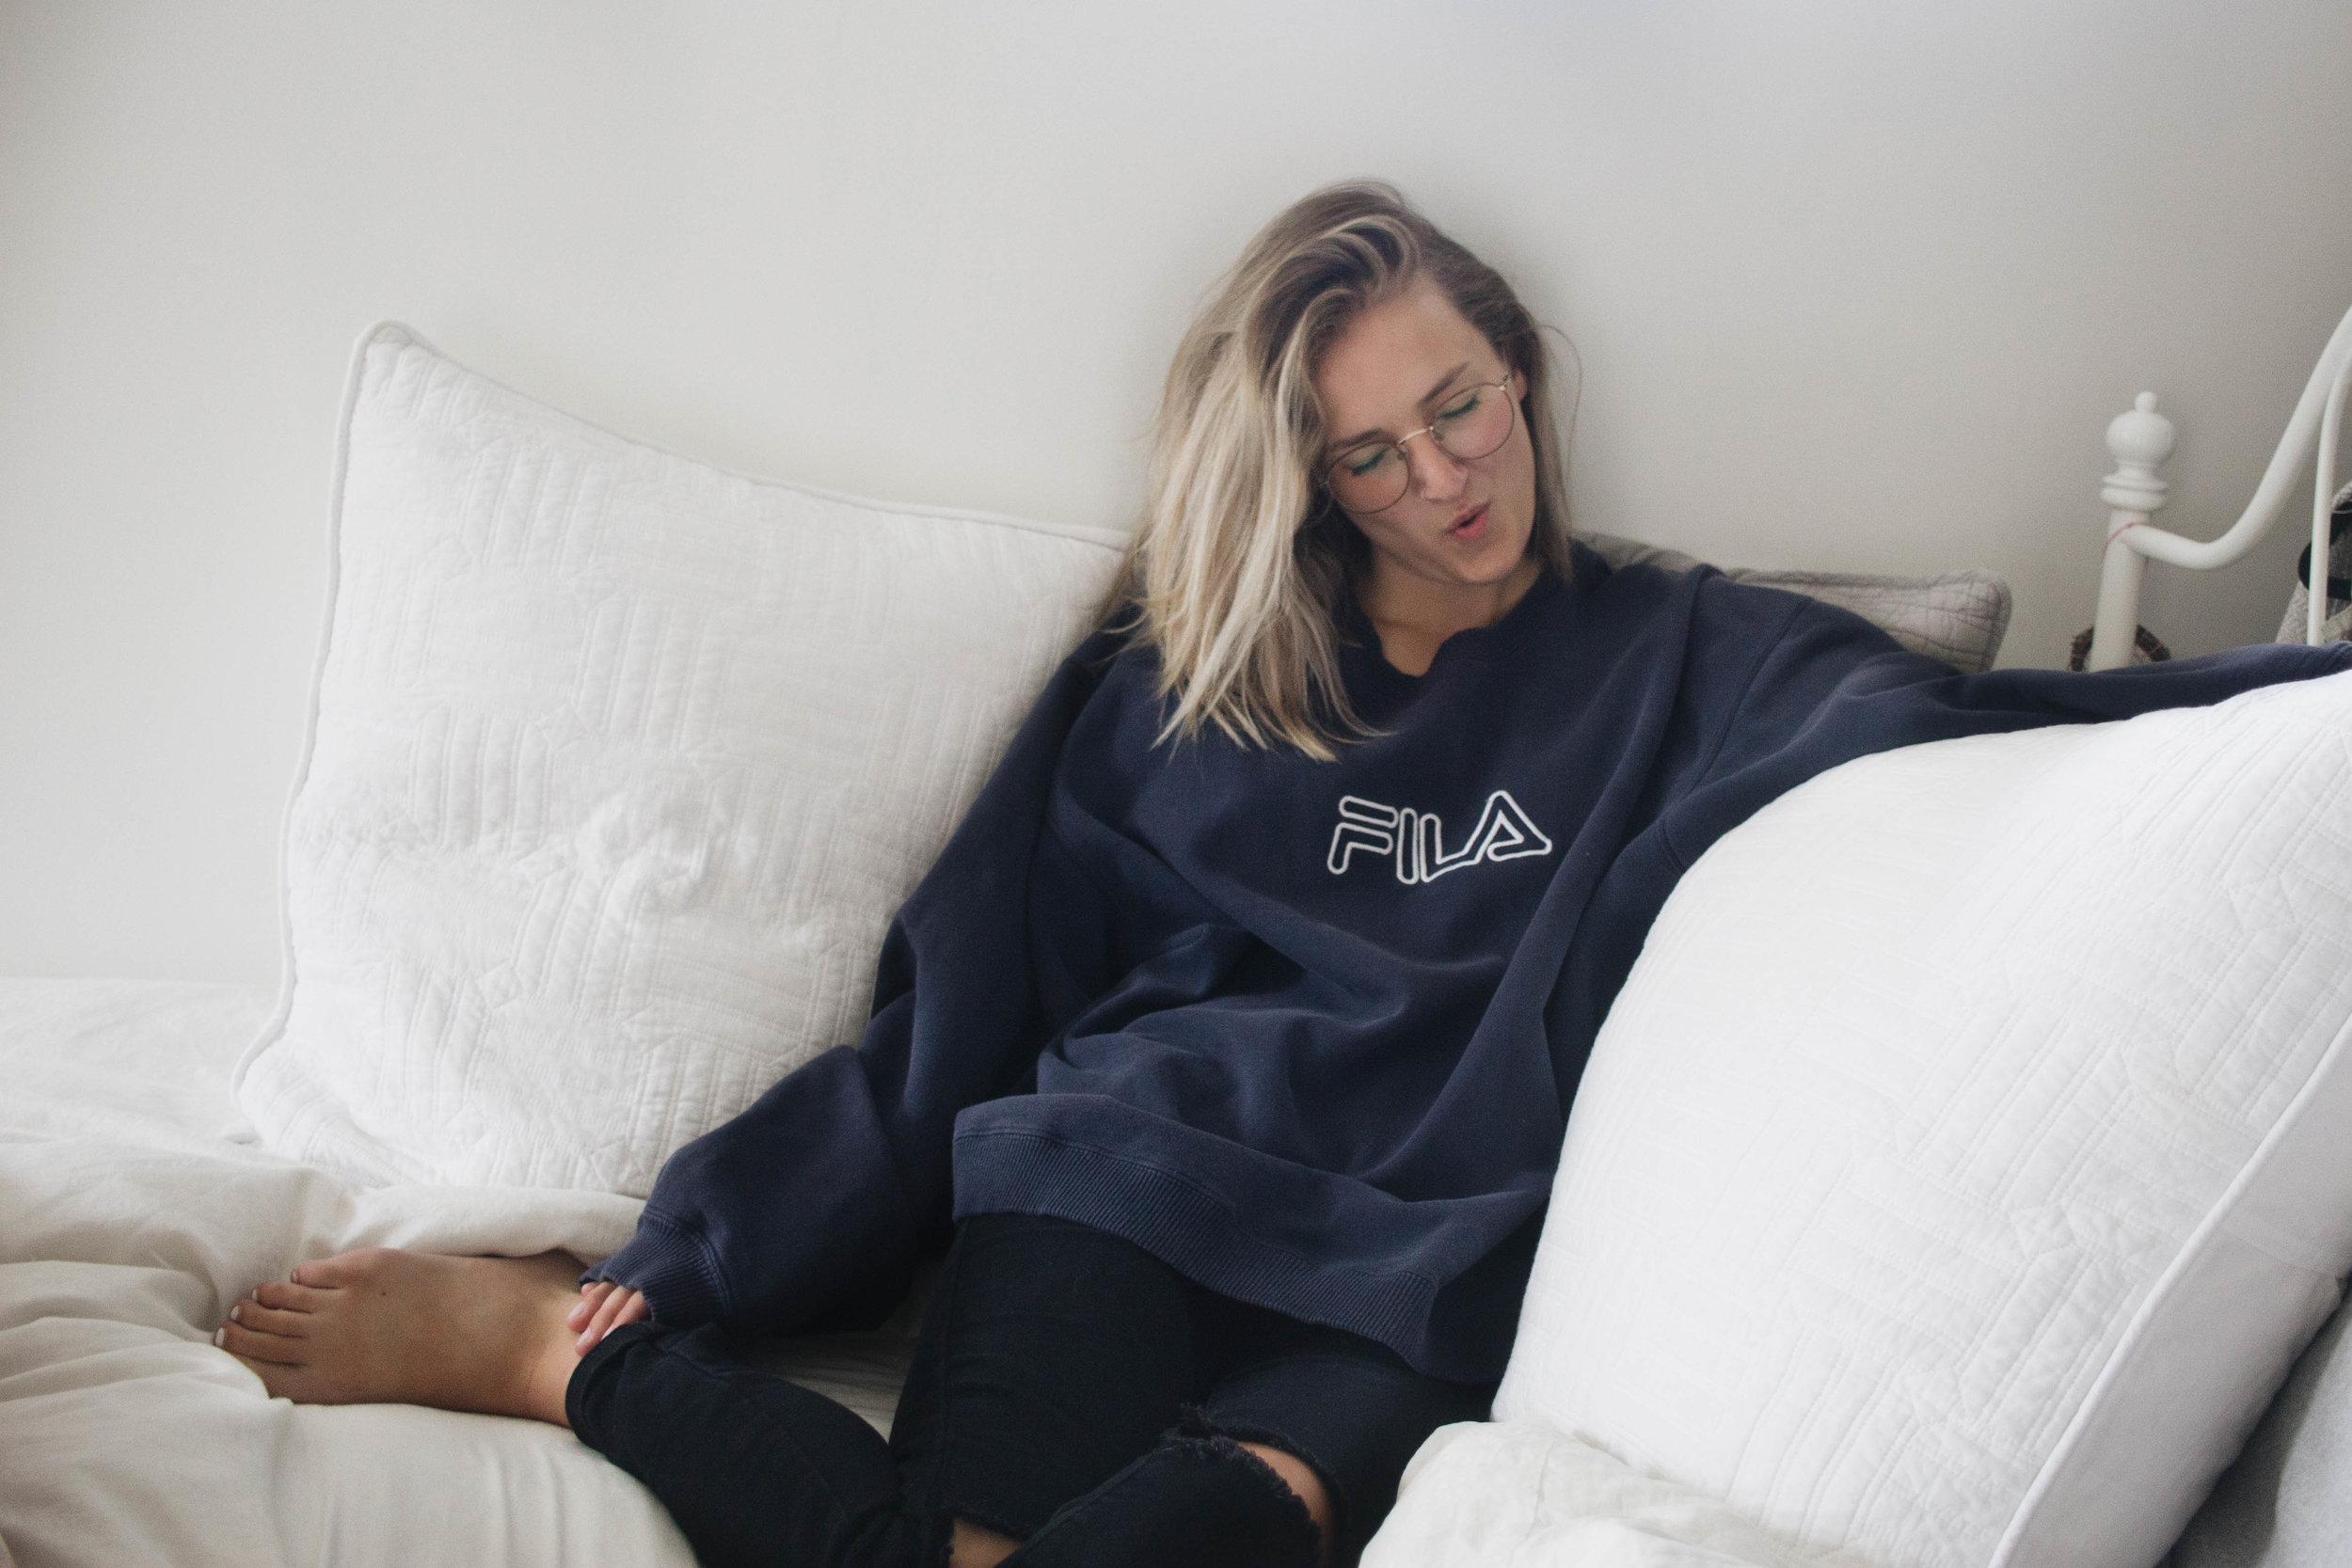 Take it Vintage - Fila Sweatshirt